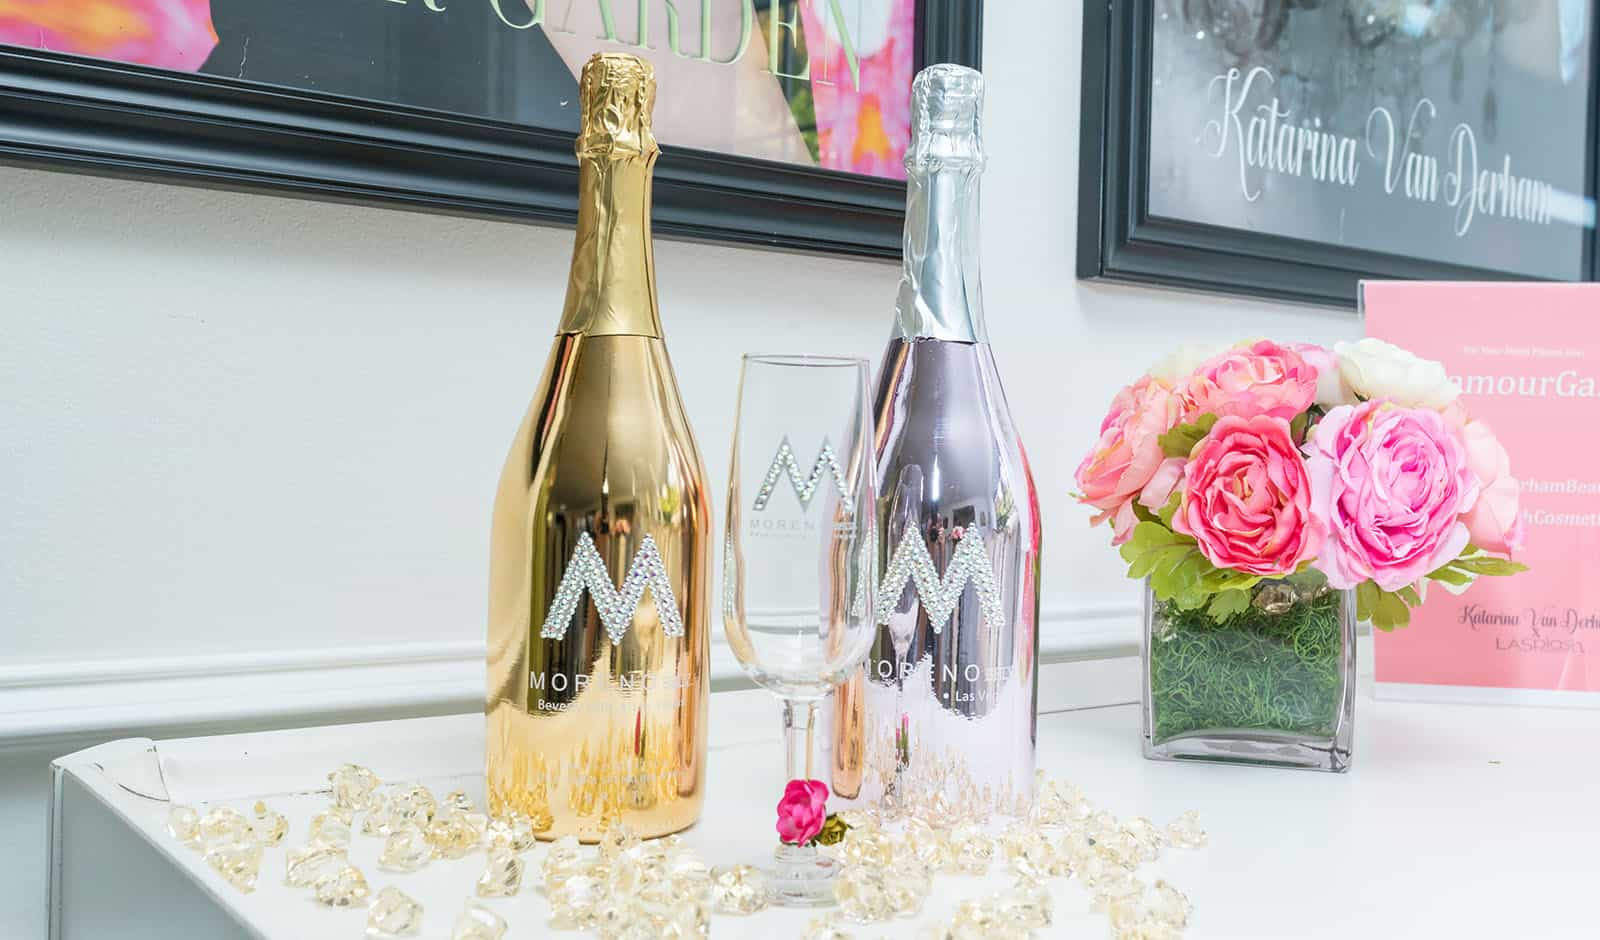 viva-glam-magazine-glamour-garden-moreno-champagne